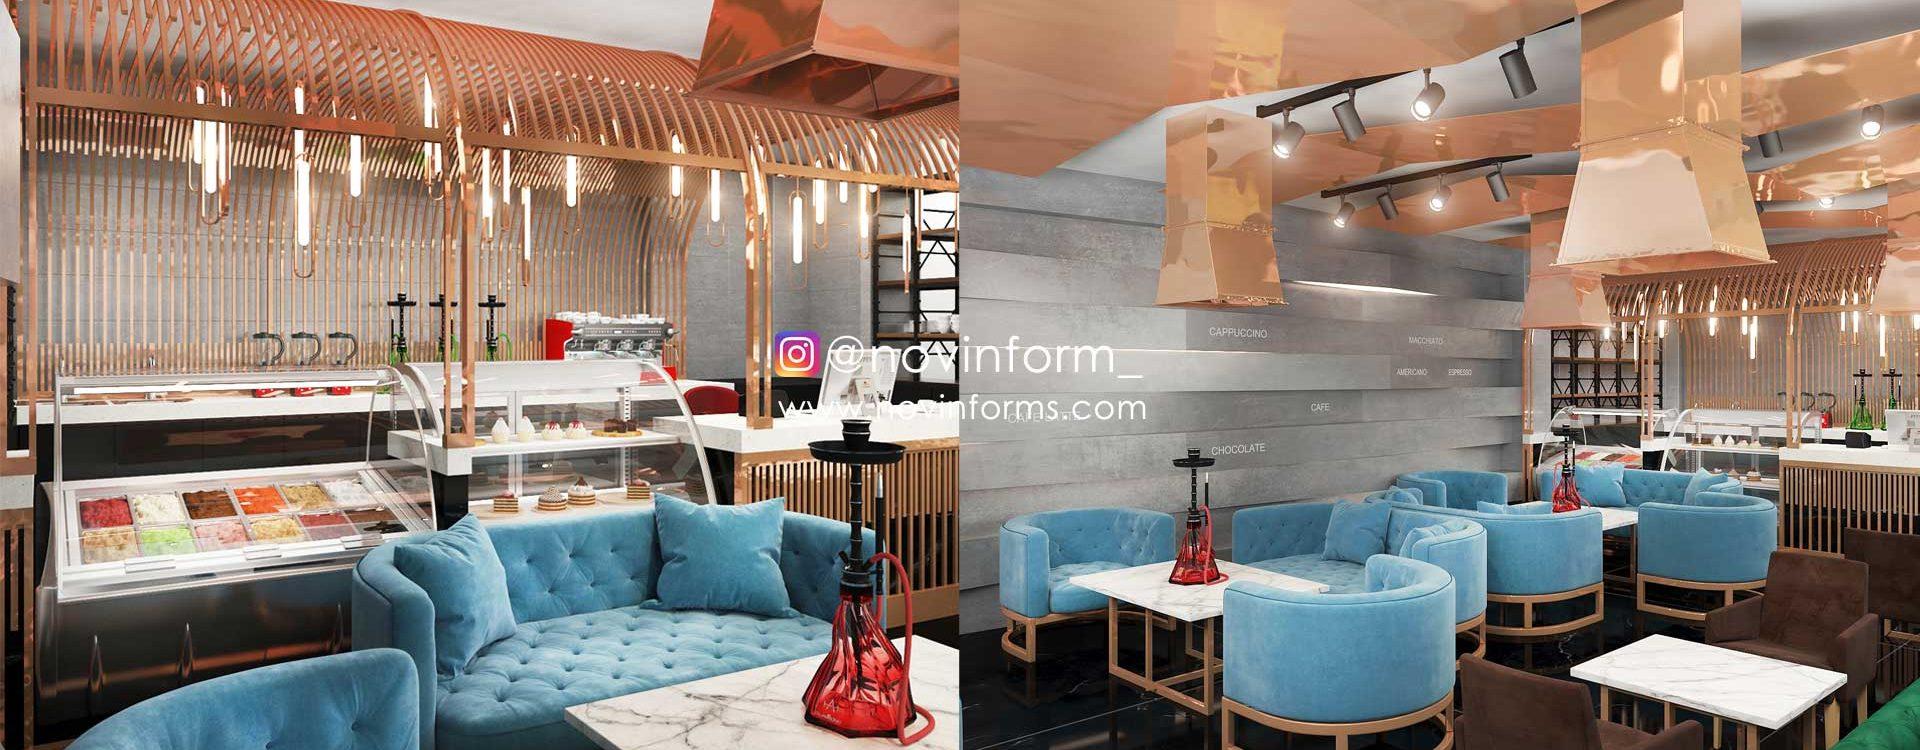 طراحی کافه مس خوزستان